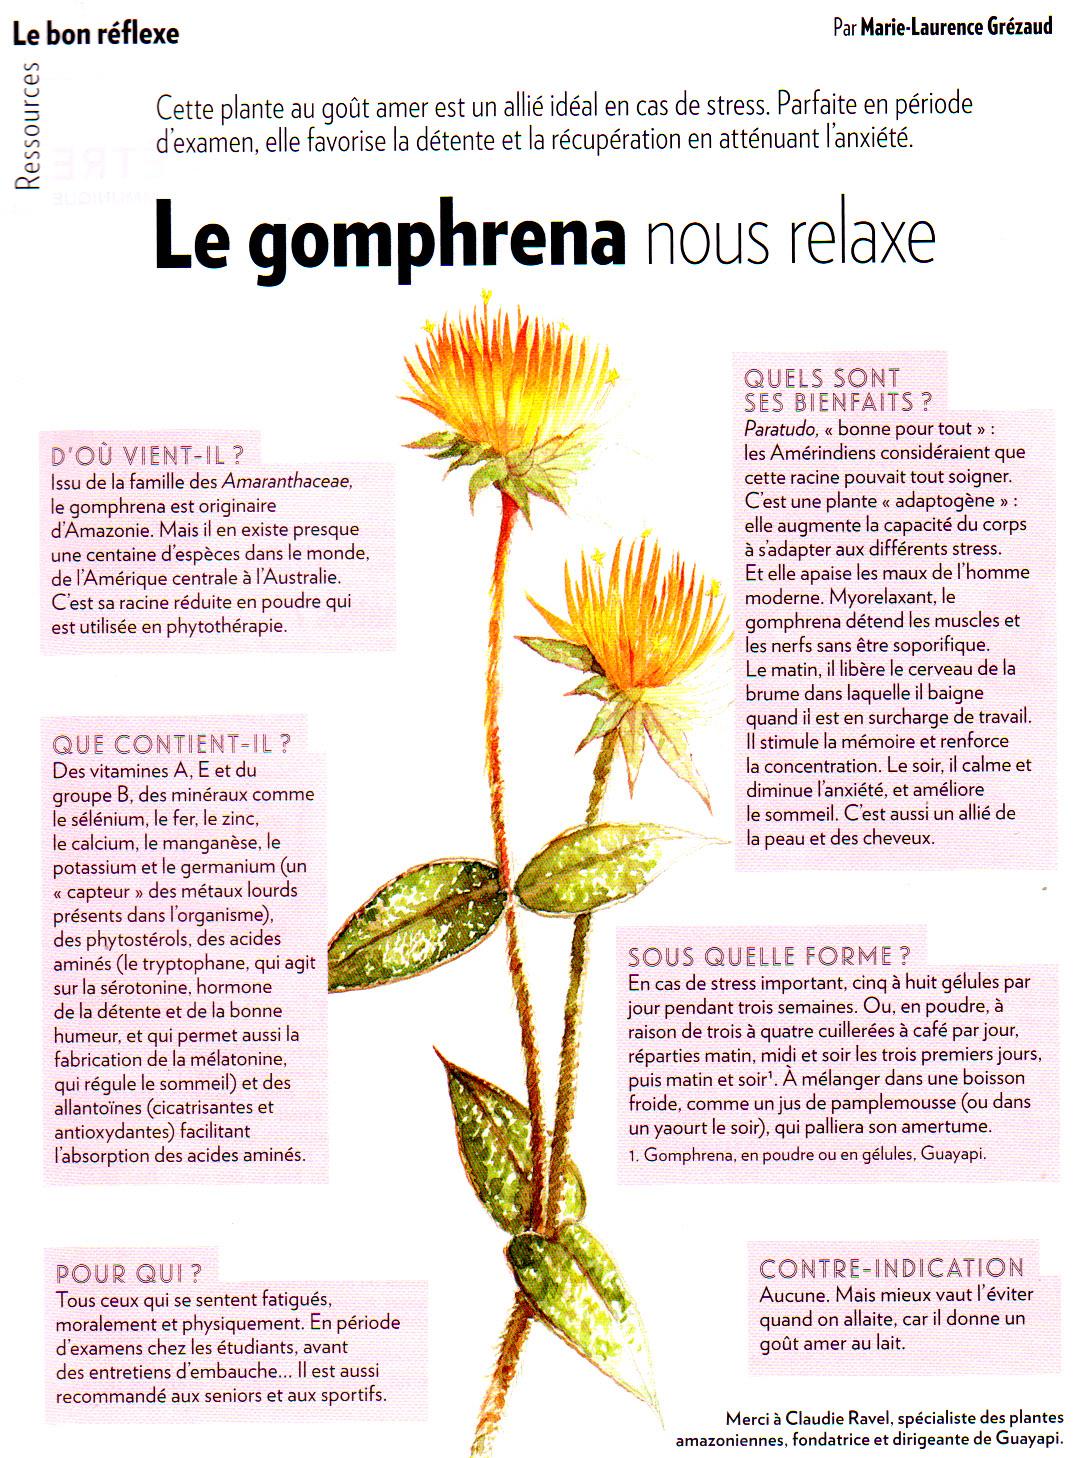 Phytospiritualité: Plantes : Le Gomphrena